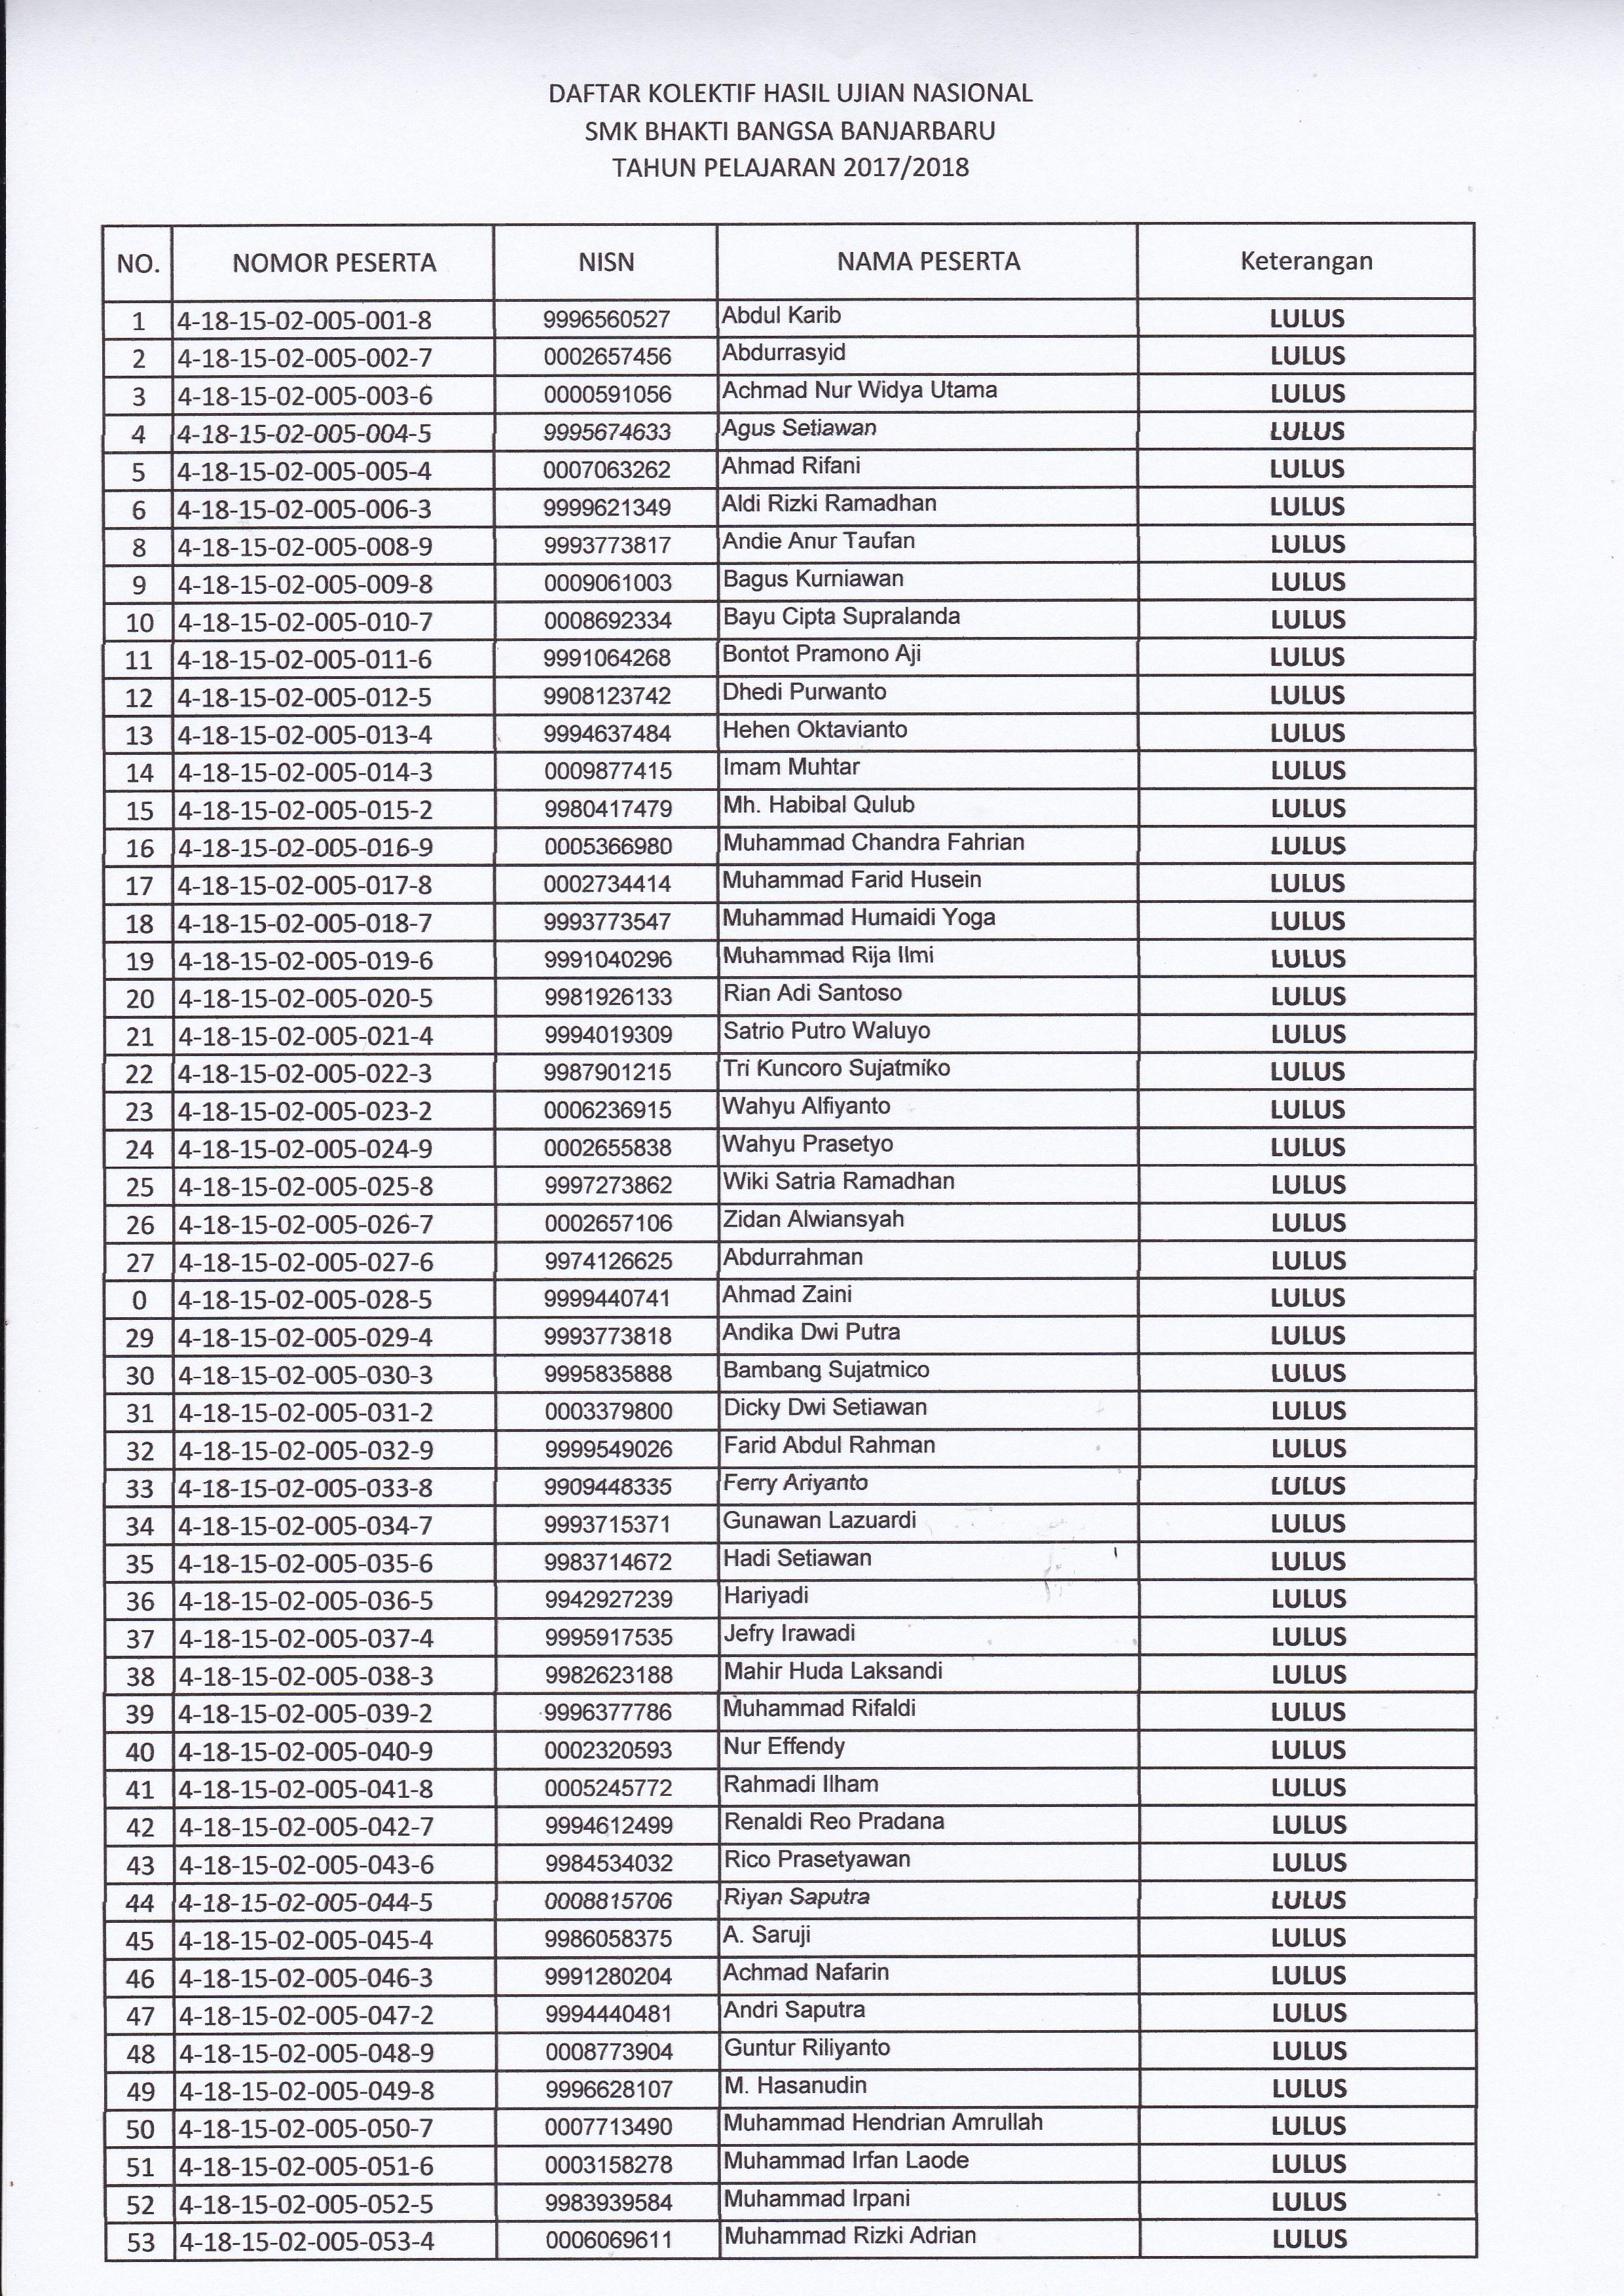 Daftar Siswa Lulusan 2018 JPG 1